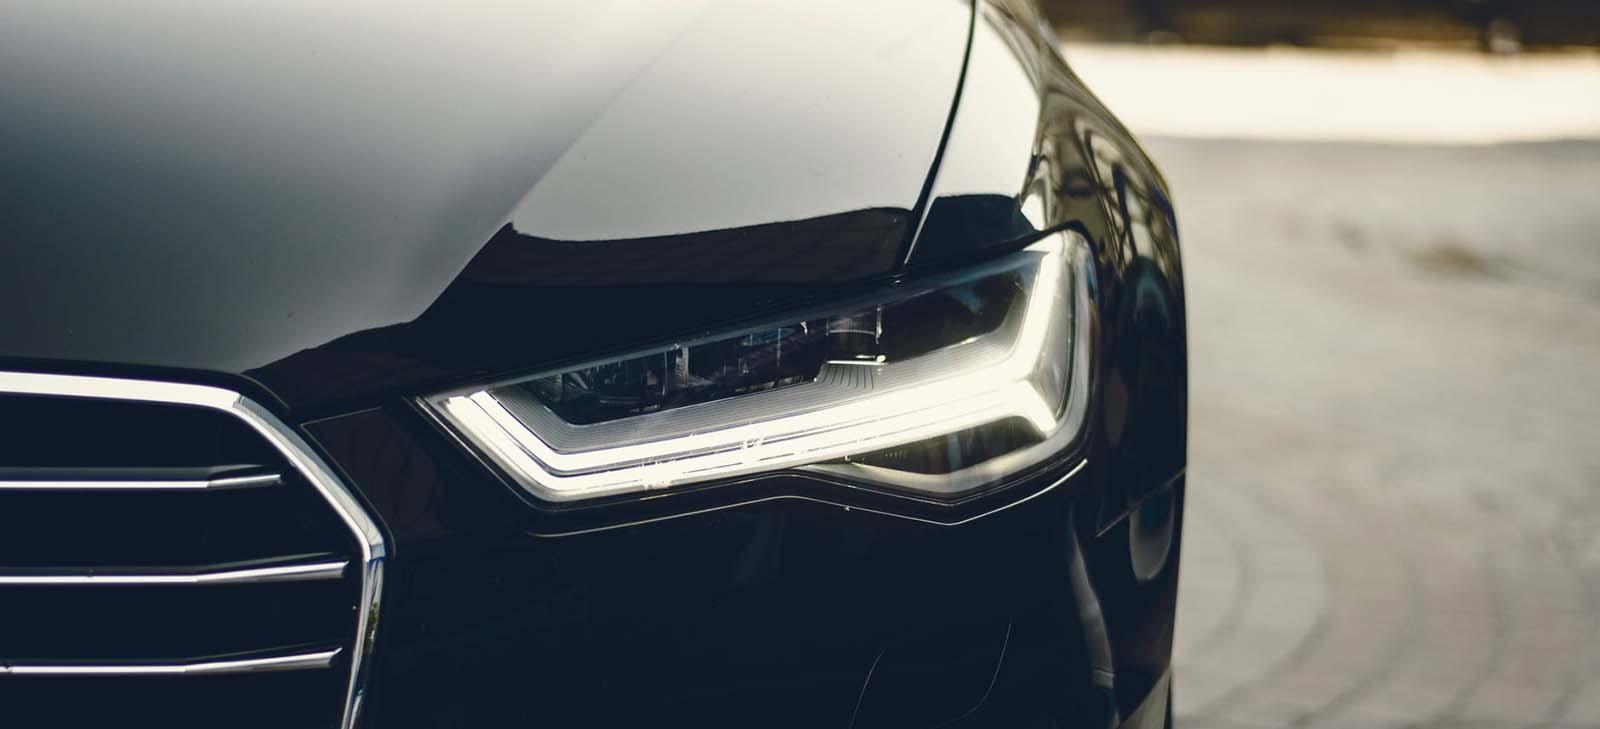 IVA Car Finance